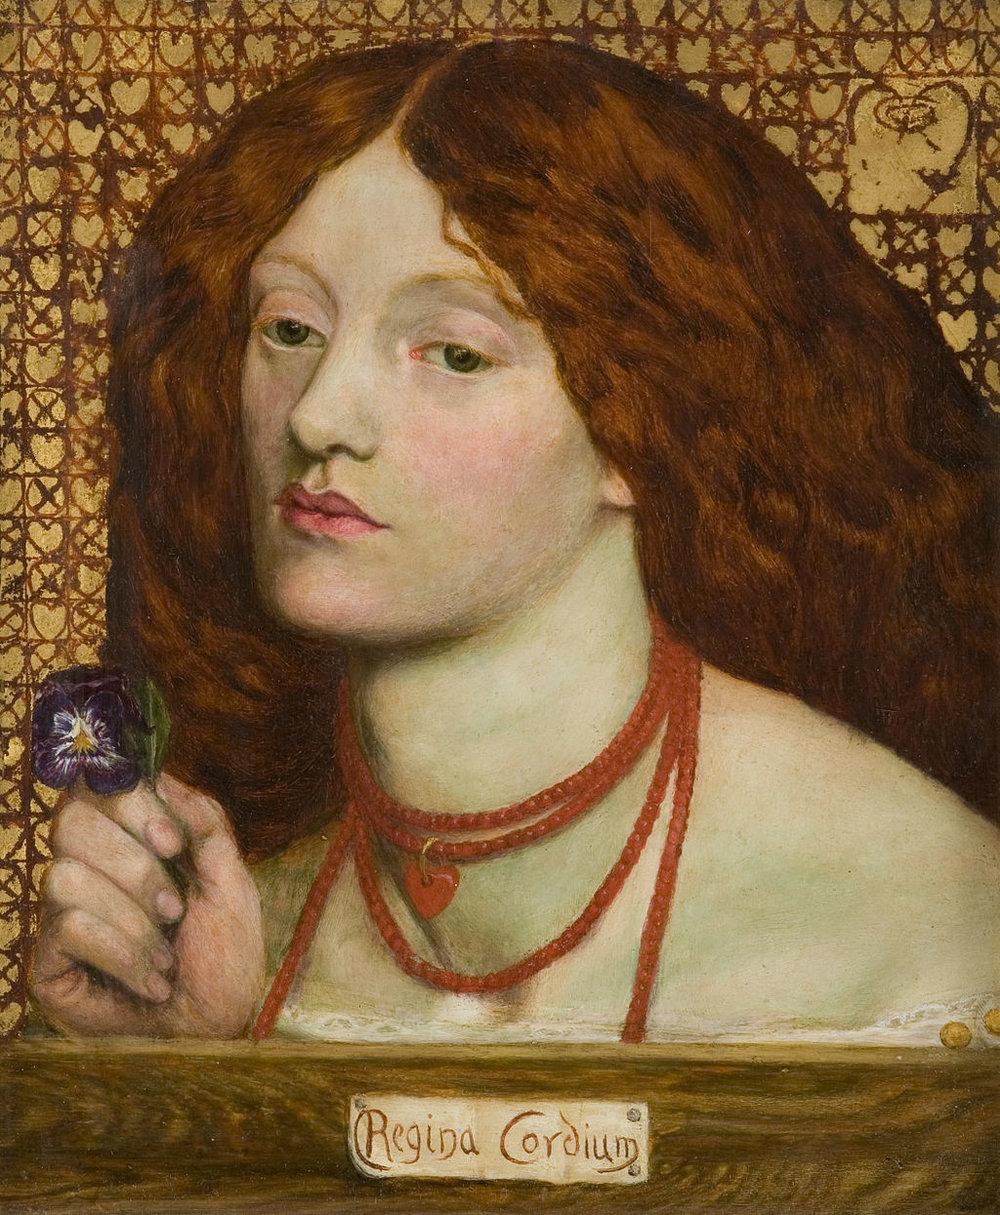 Dante_Gabriel_Rossetti_-_Regina_Cordium_(1860).jpg